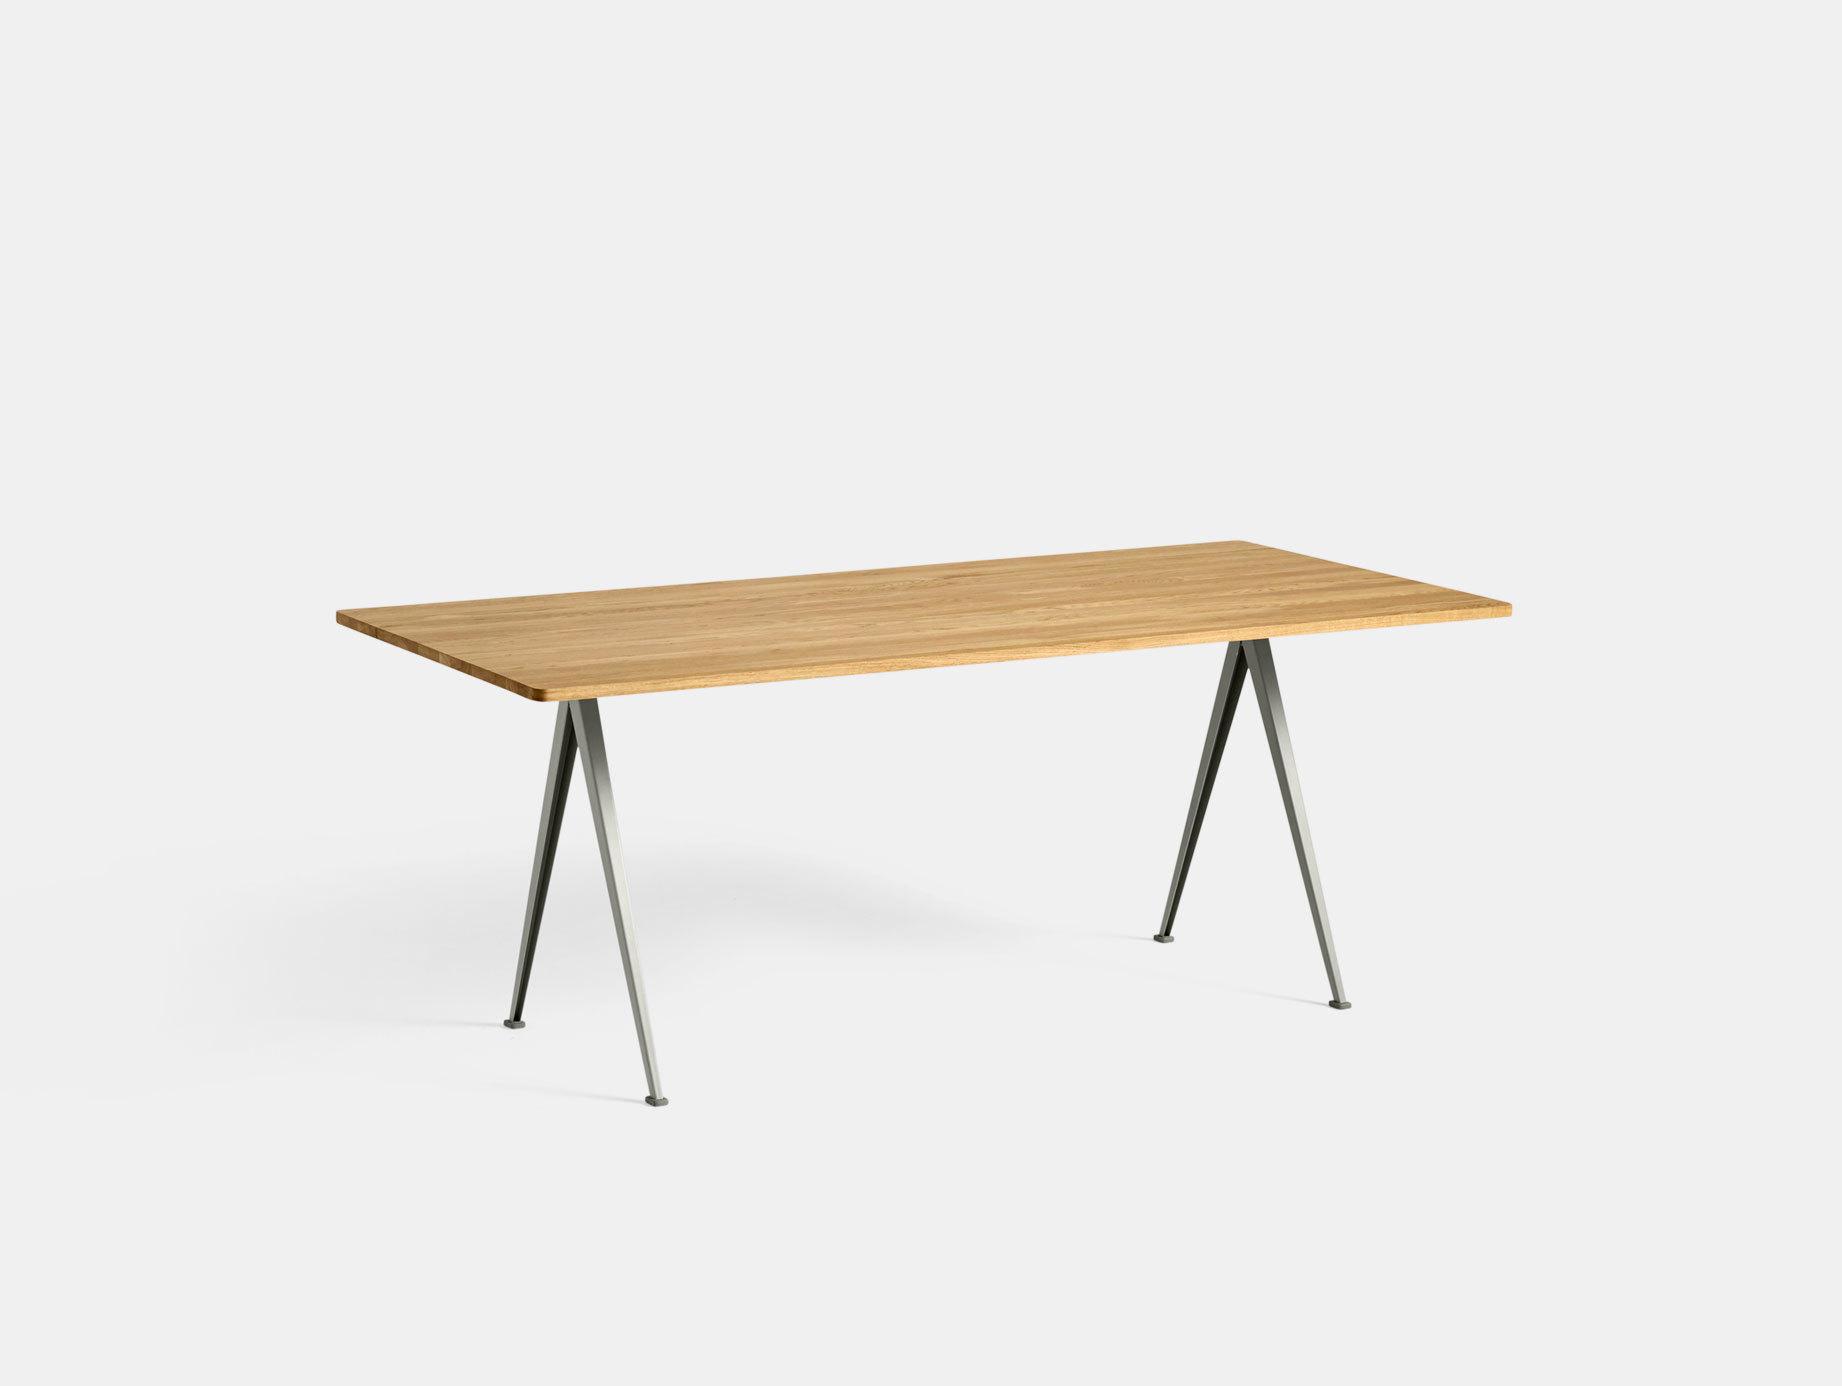 Hay Pyramid Table 02 Oak Beige L190 Wim Rietveld Friso Kramer